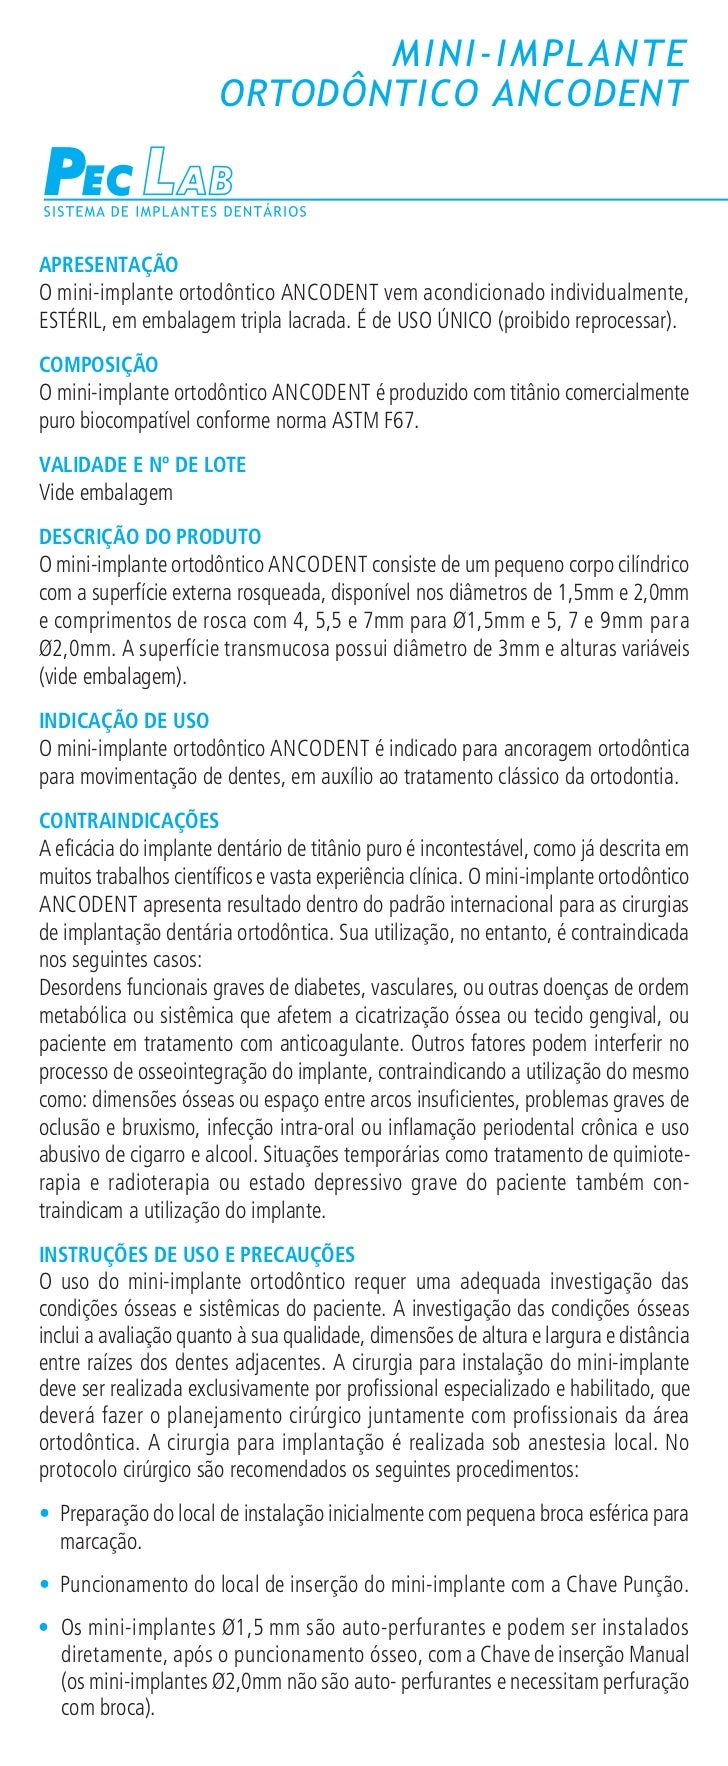 MINI-IMPLA NTE                       ORTODÔNTICO ANCODENTAPRESENTAÇÃOO mini-implante ortodôntico ANCODENT vem acondicionad...